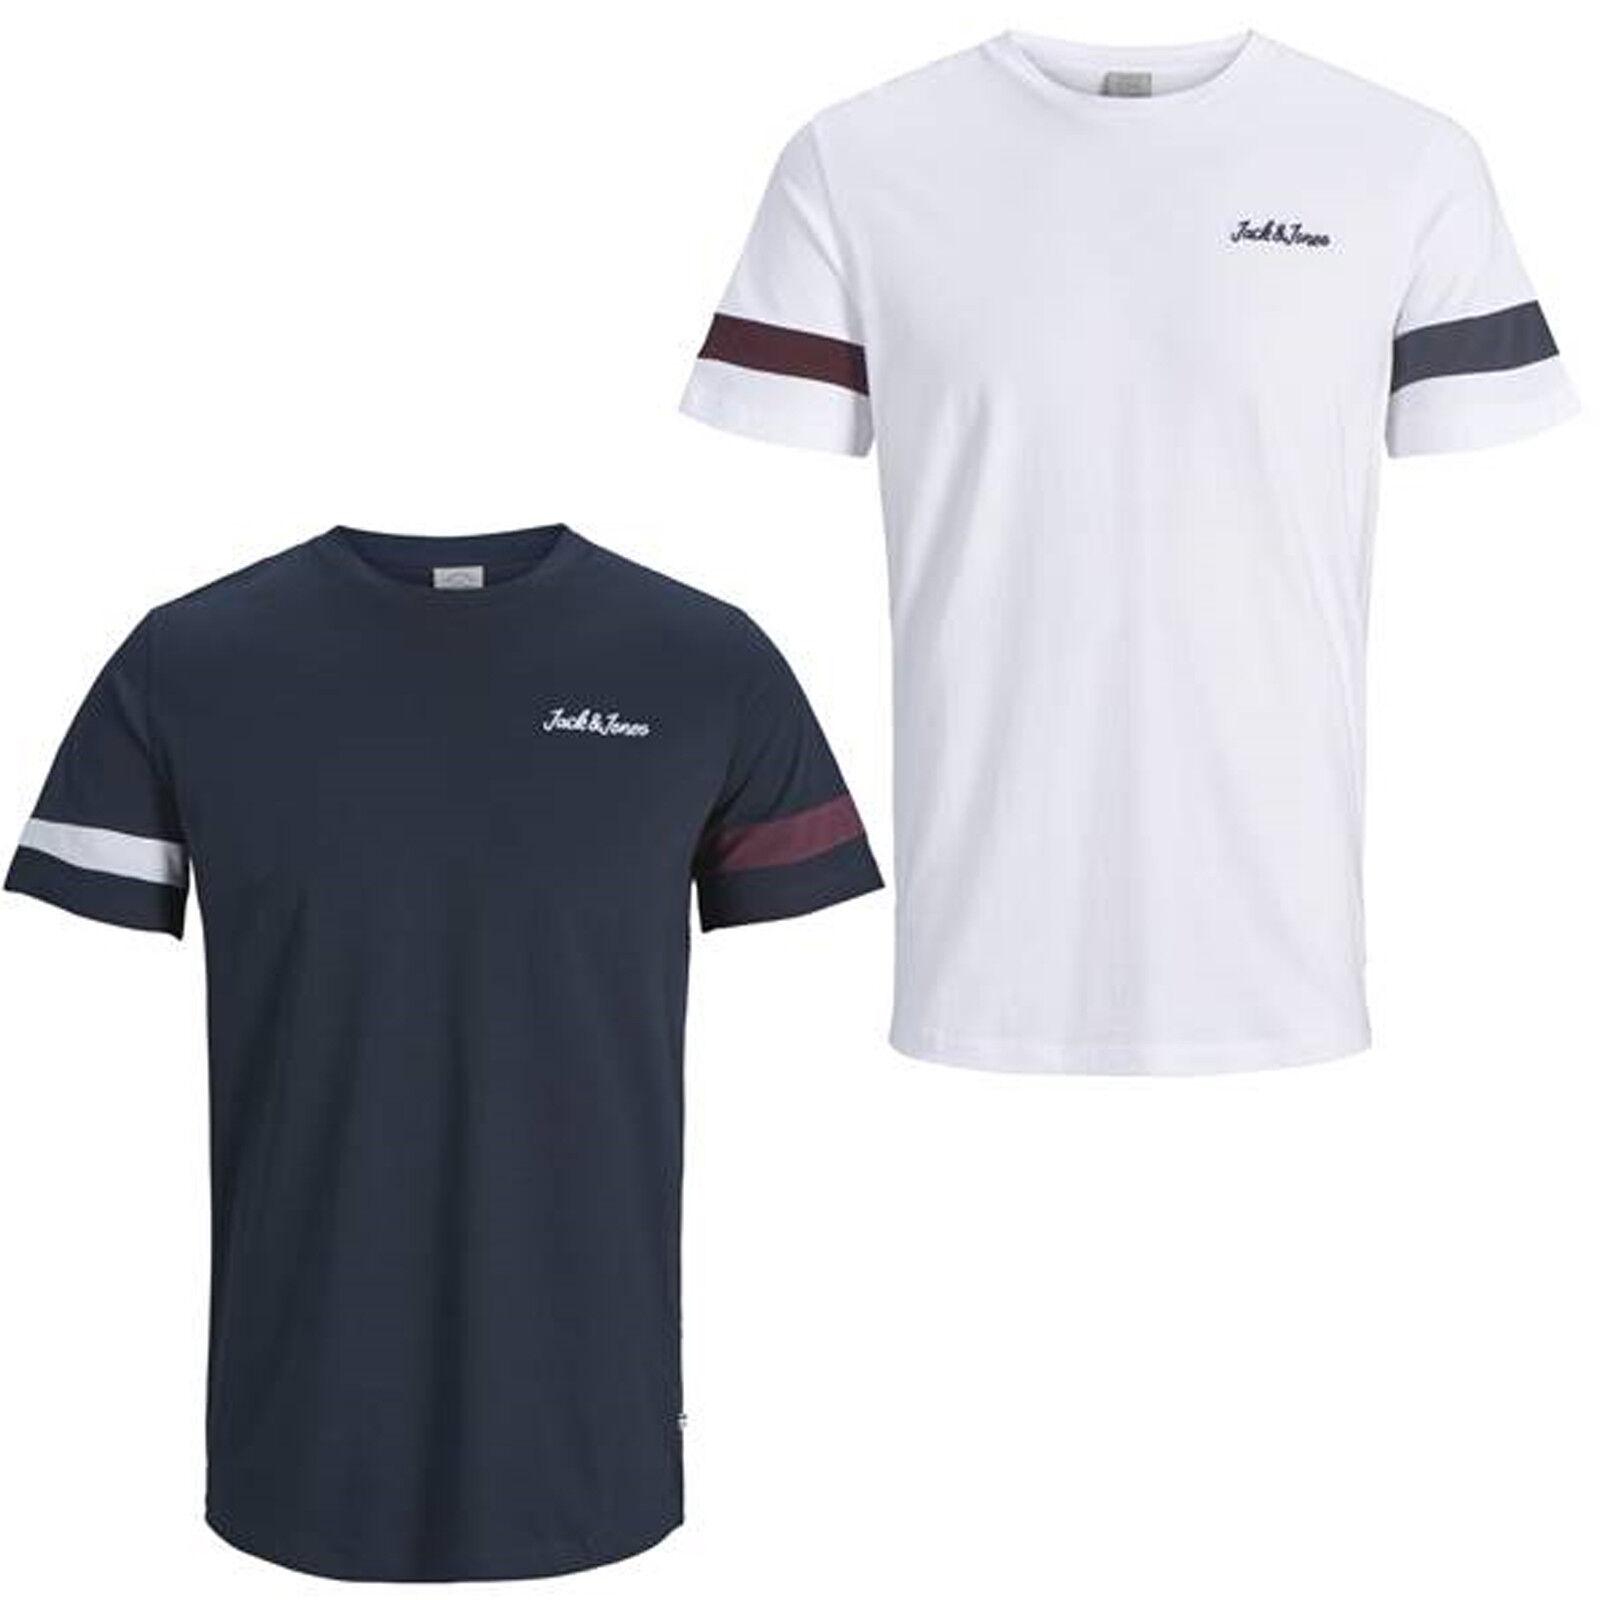 Jack /& Jones T-shirt grande girocollo a maniche corte Uomo Polo Nero//Bianco//Navy Nuovo